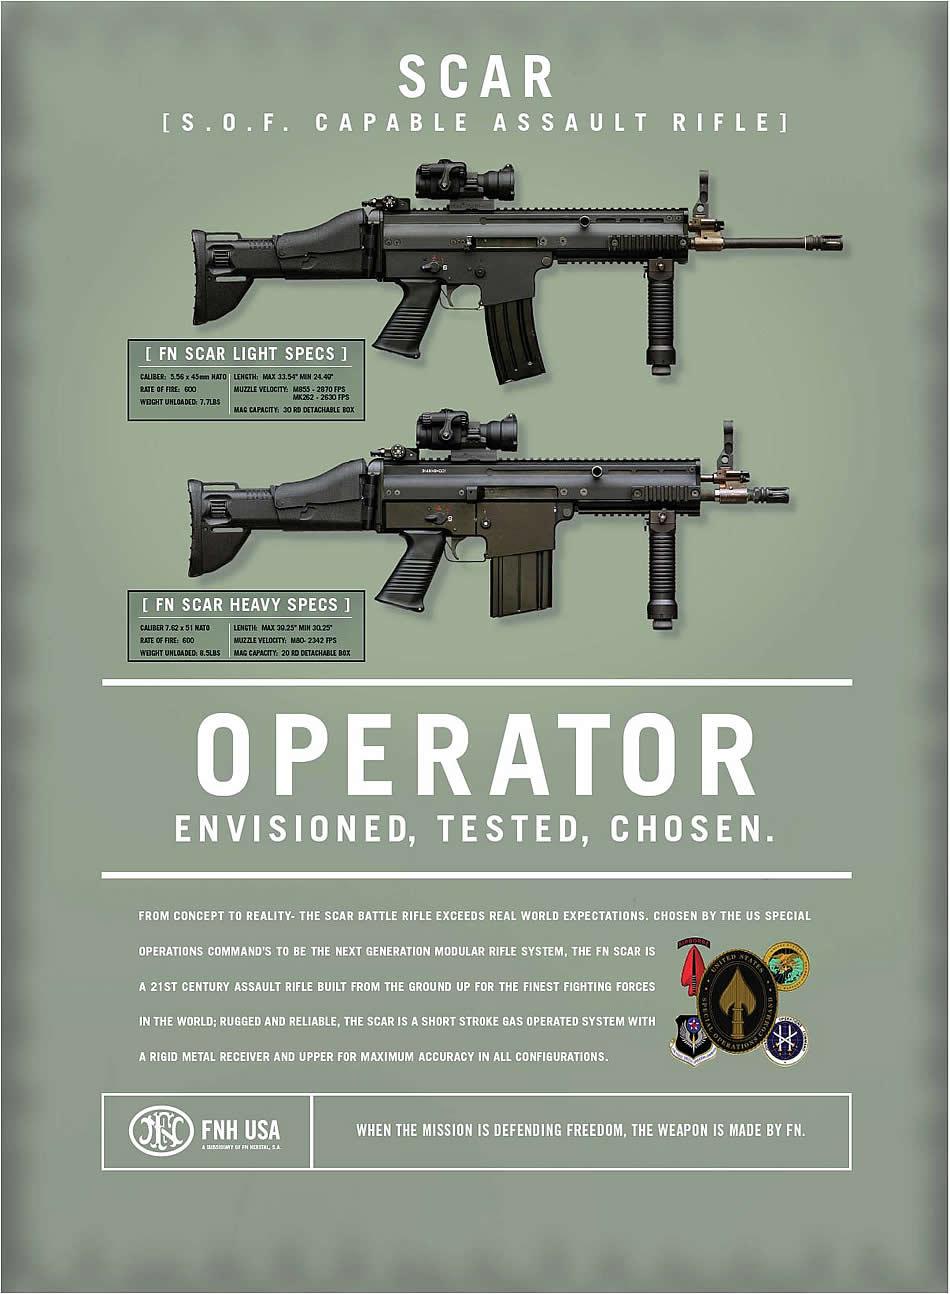 Military Photos SOF Capable Assault Rifle